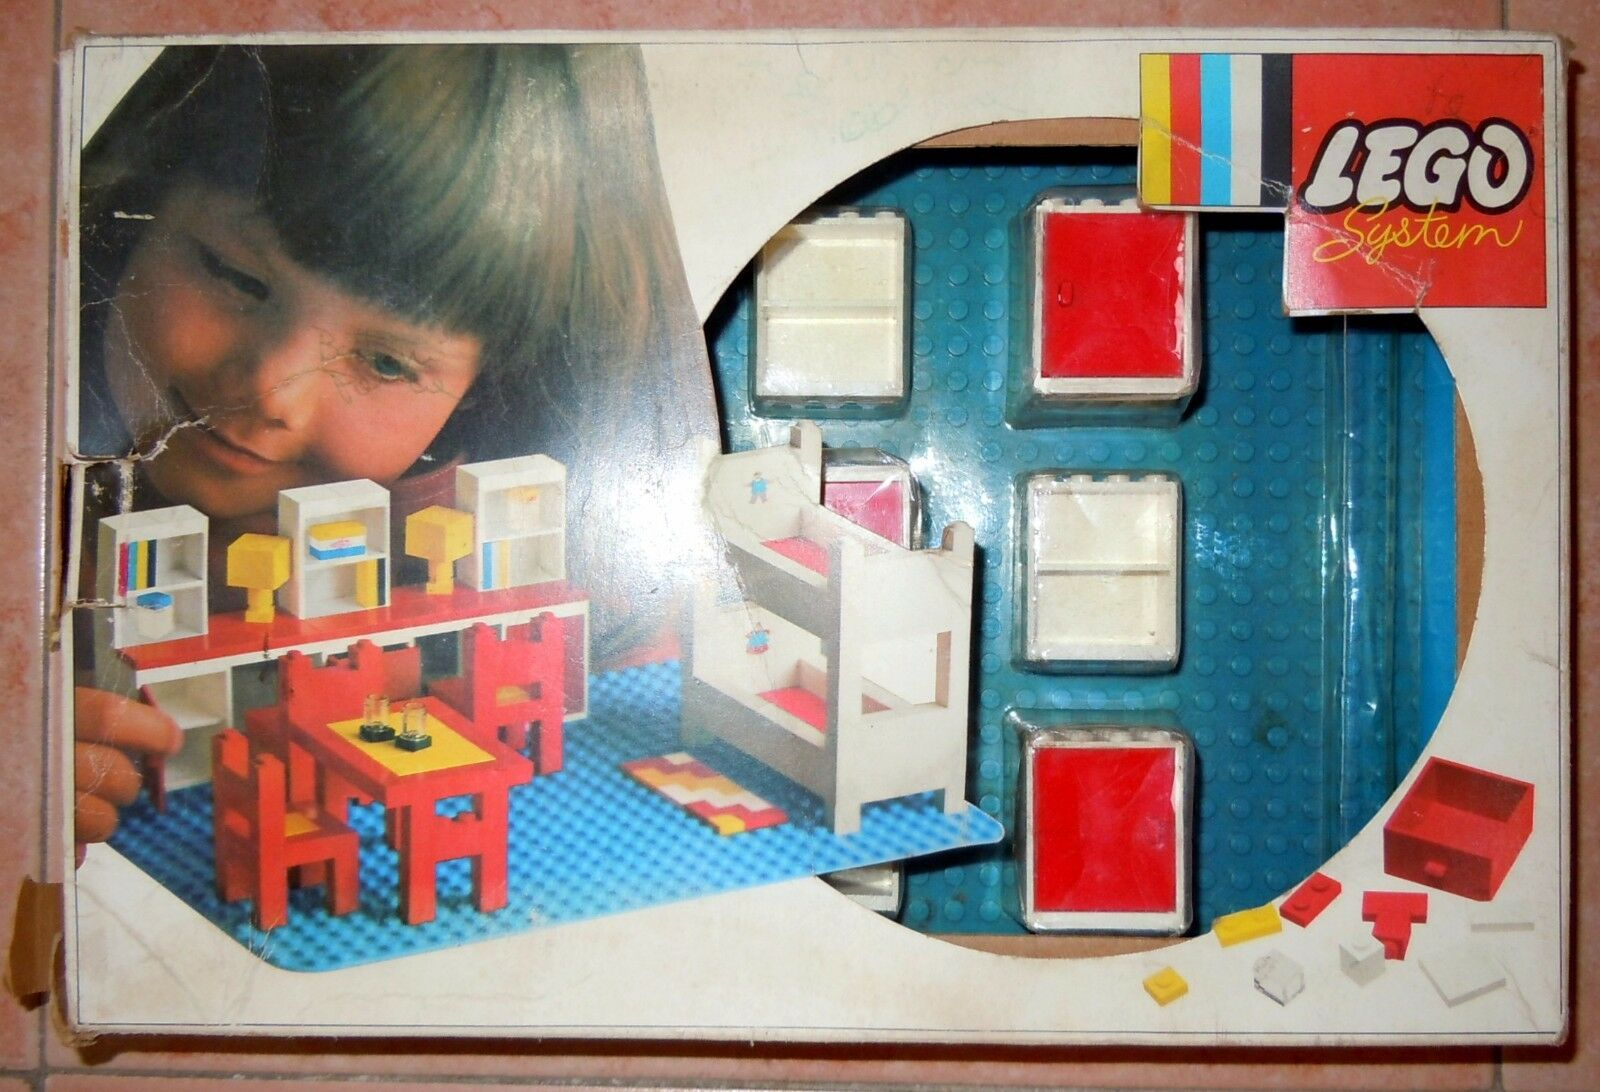 LEGO SYSTEM 262 Kinder- room Set 1972 Hausfrau